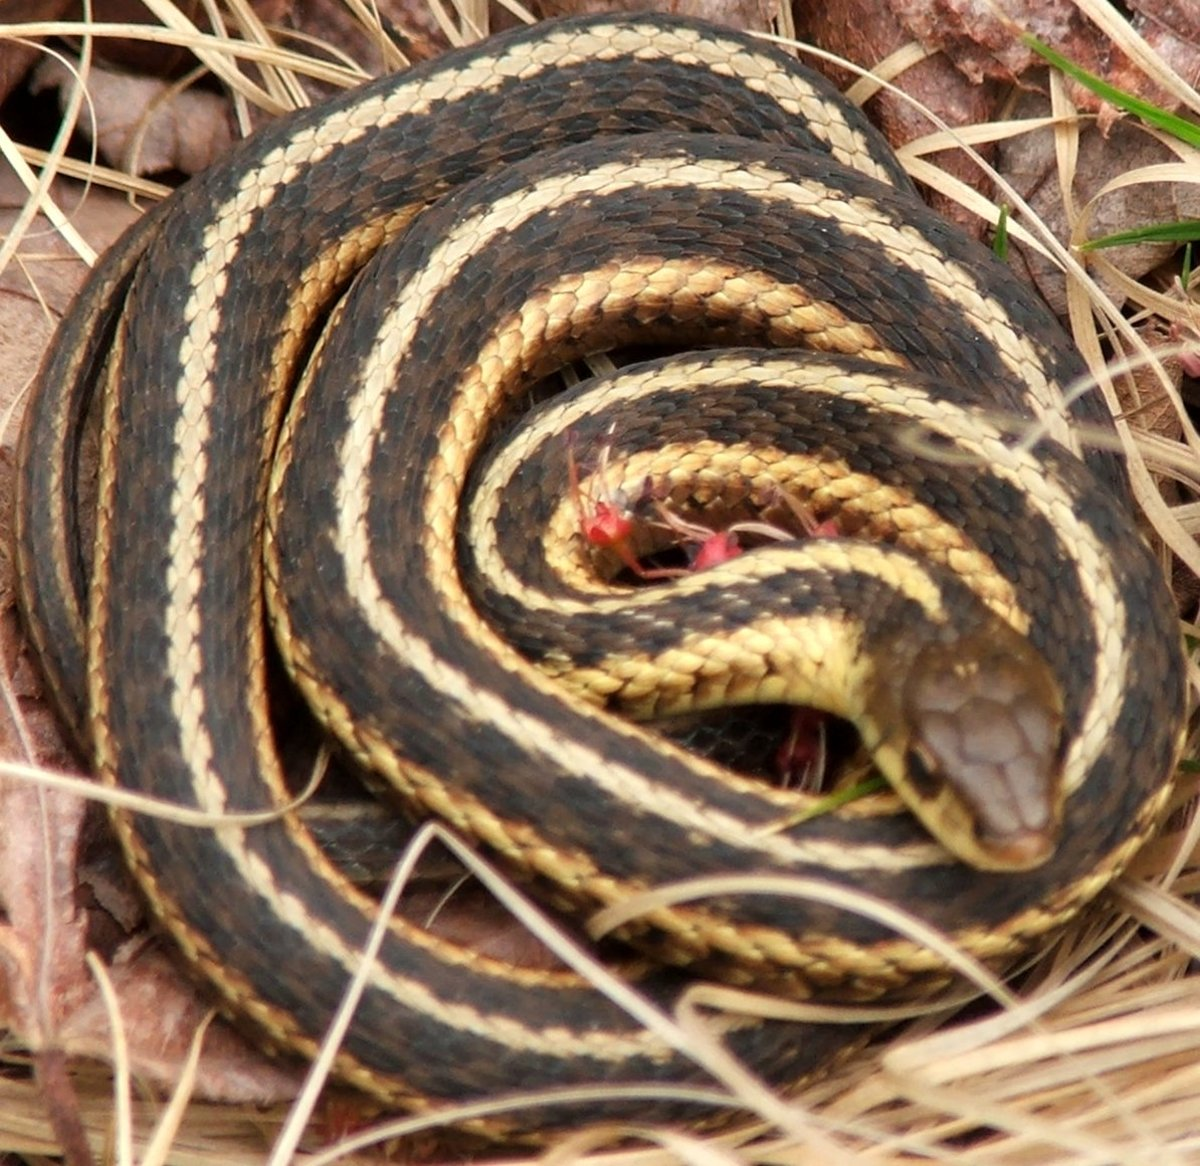 Butler's Garter Snake (Thamnophis butleri) found in northeastern Indiana.